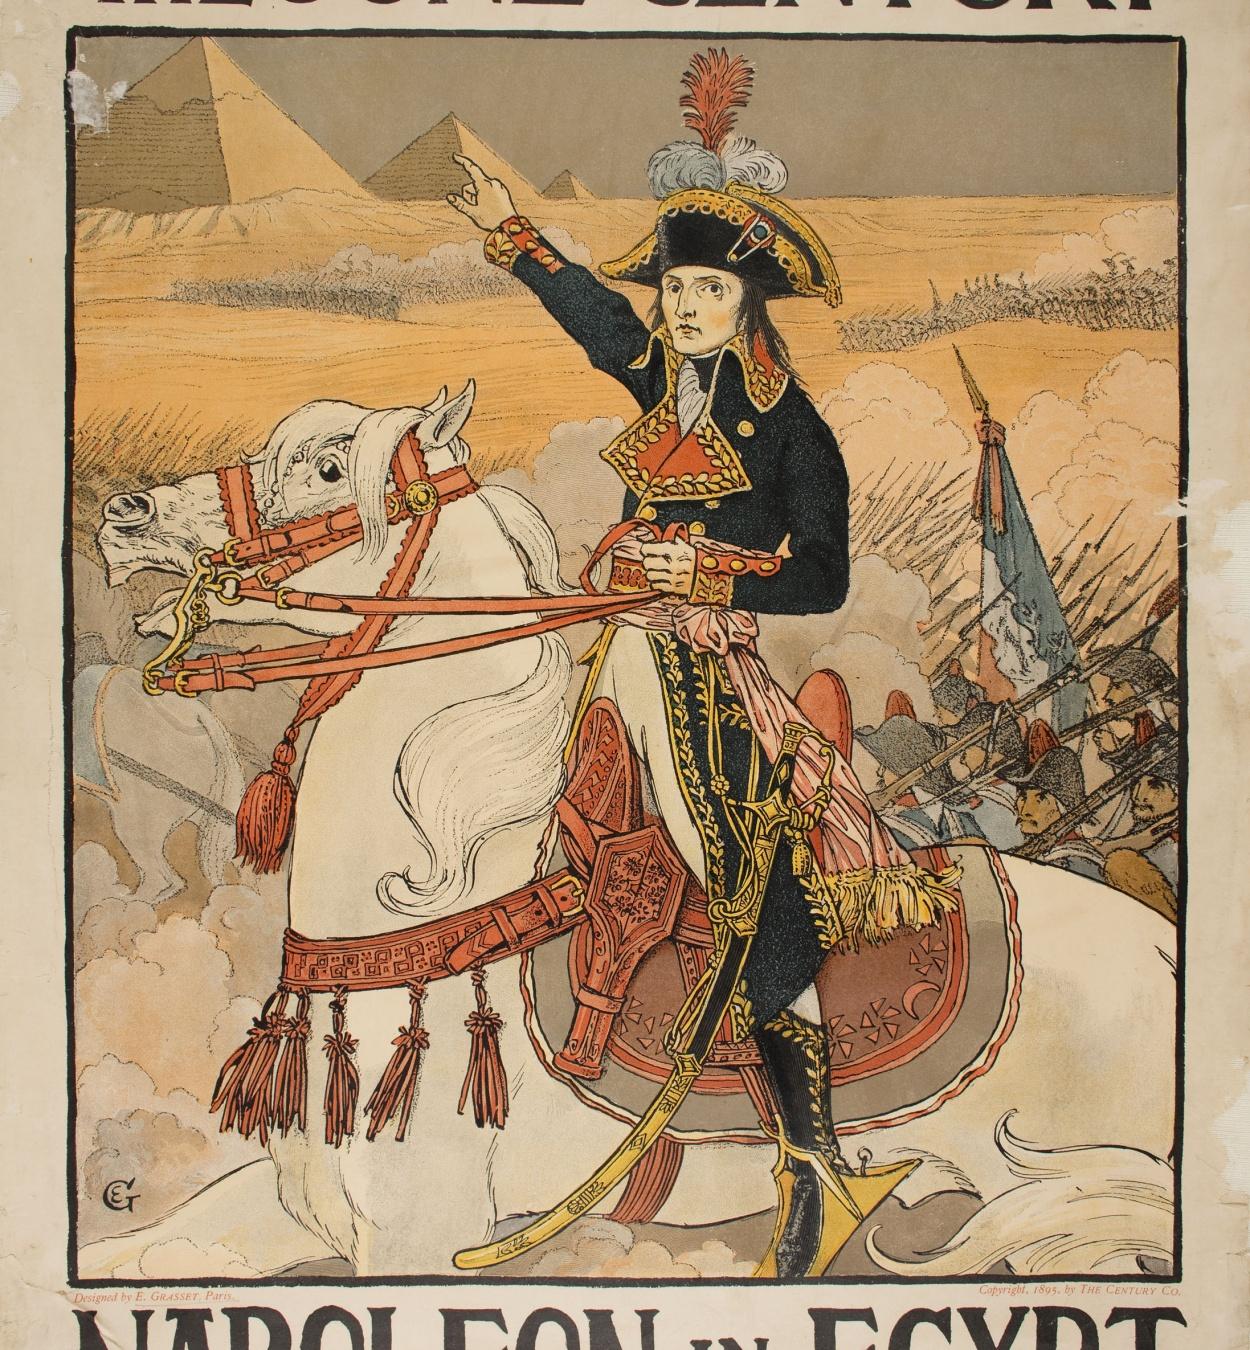 Eugène Samuel Grasset - The June Century. Napoleon in Egypt - 1895